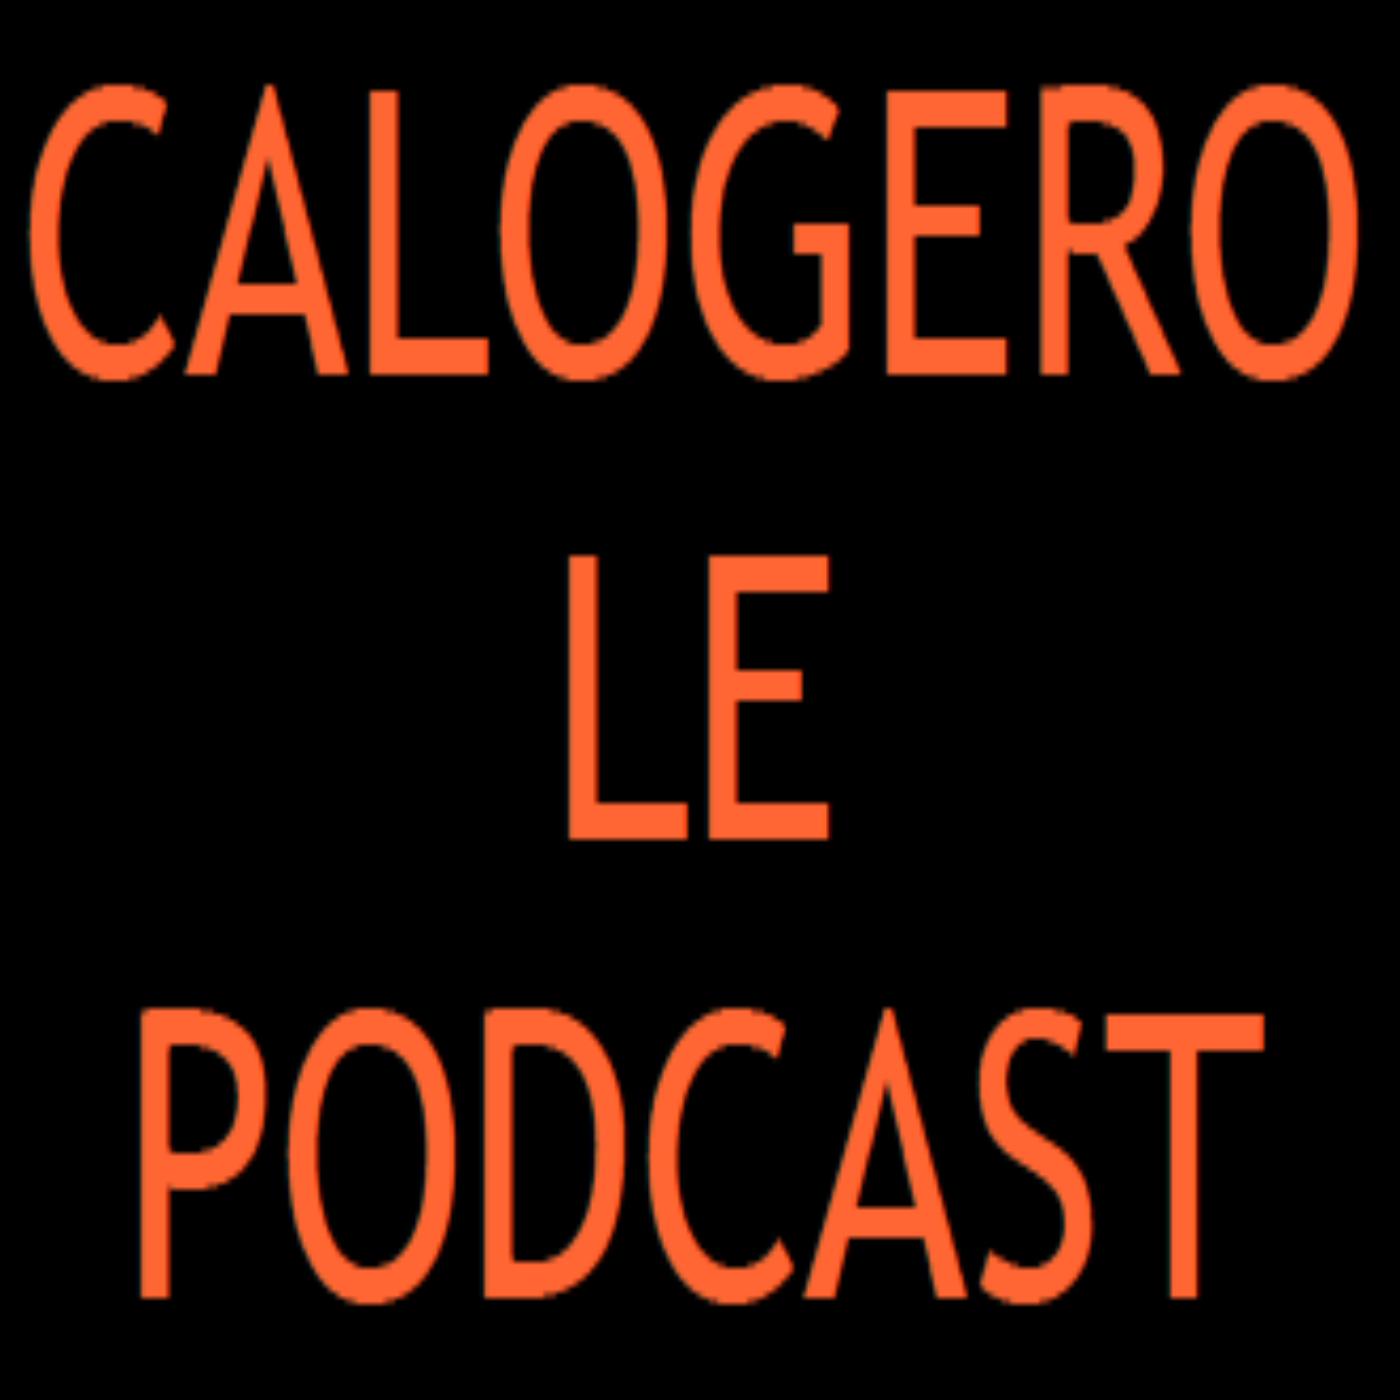 Podcast Episode 8 : Merchandising et Tribute bands